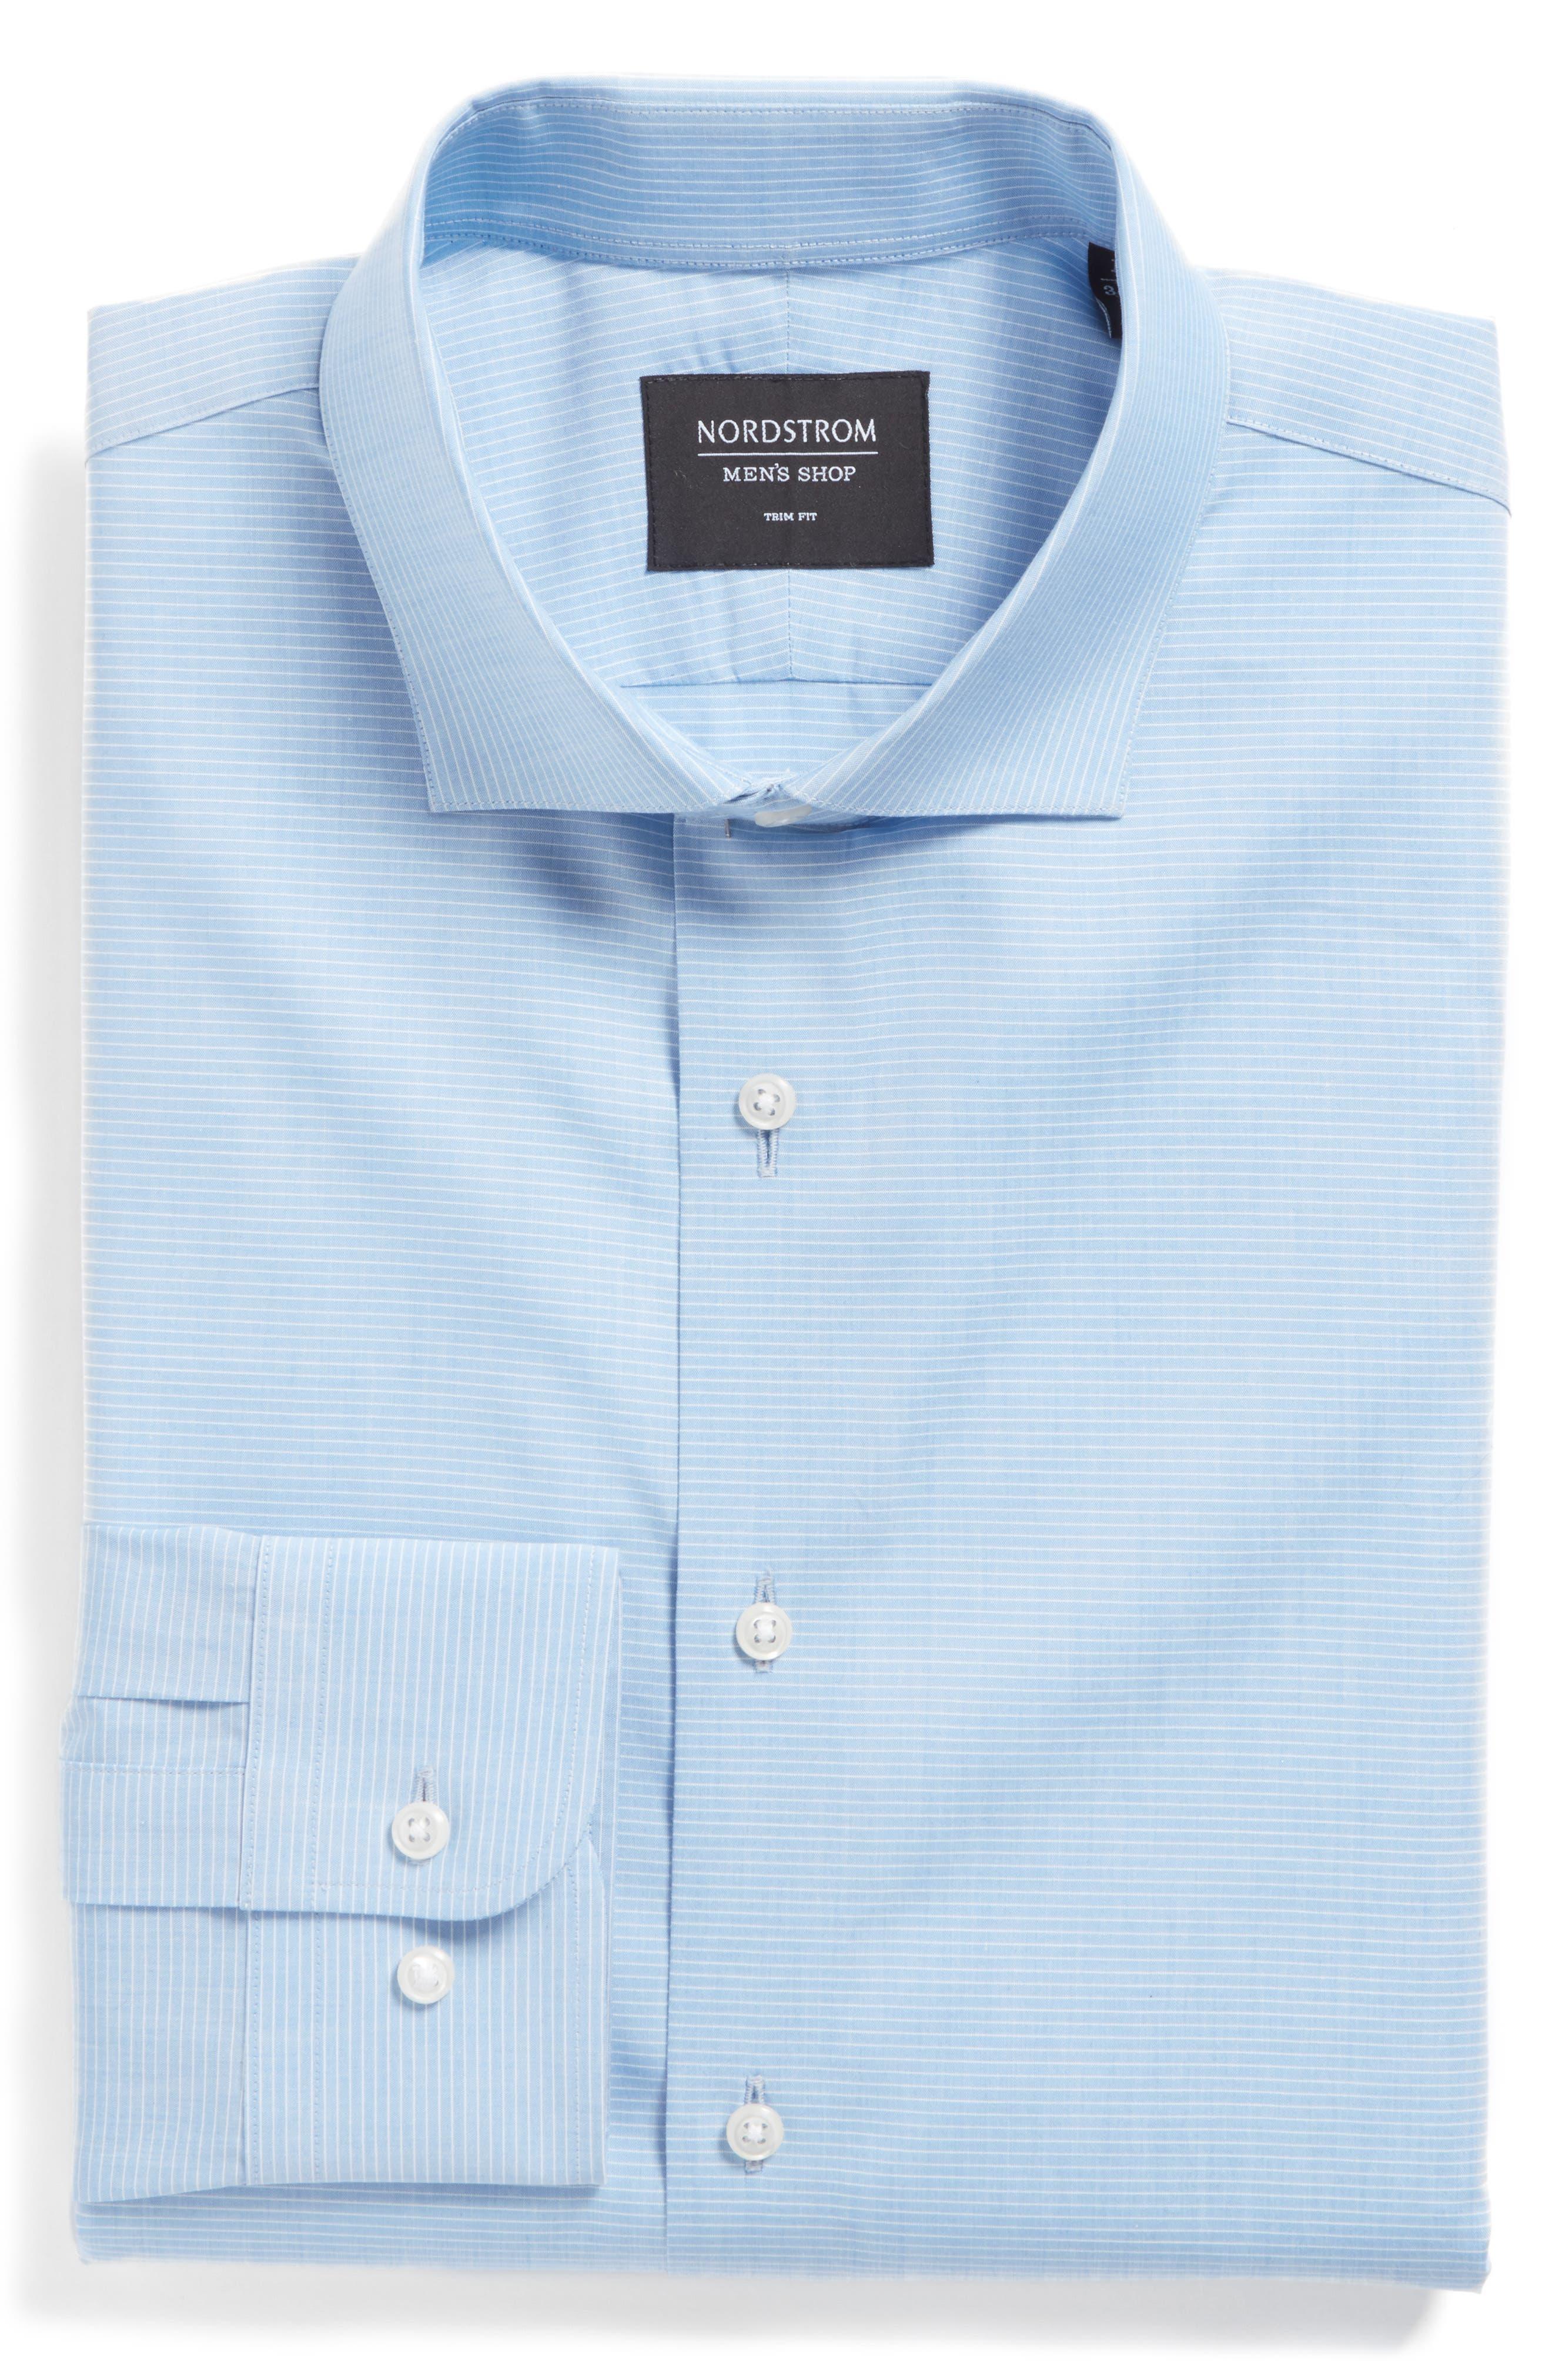 Main Image - Nordstrom Men's Shop Trim Fit Stripe Dress Shirt